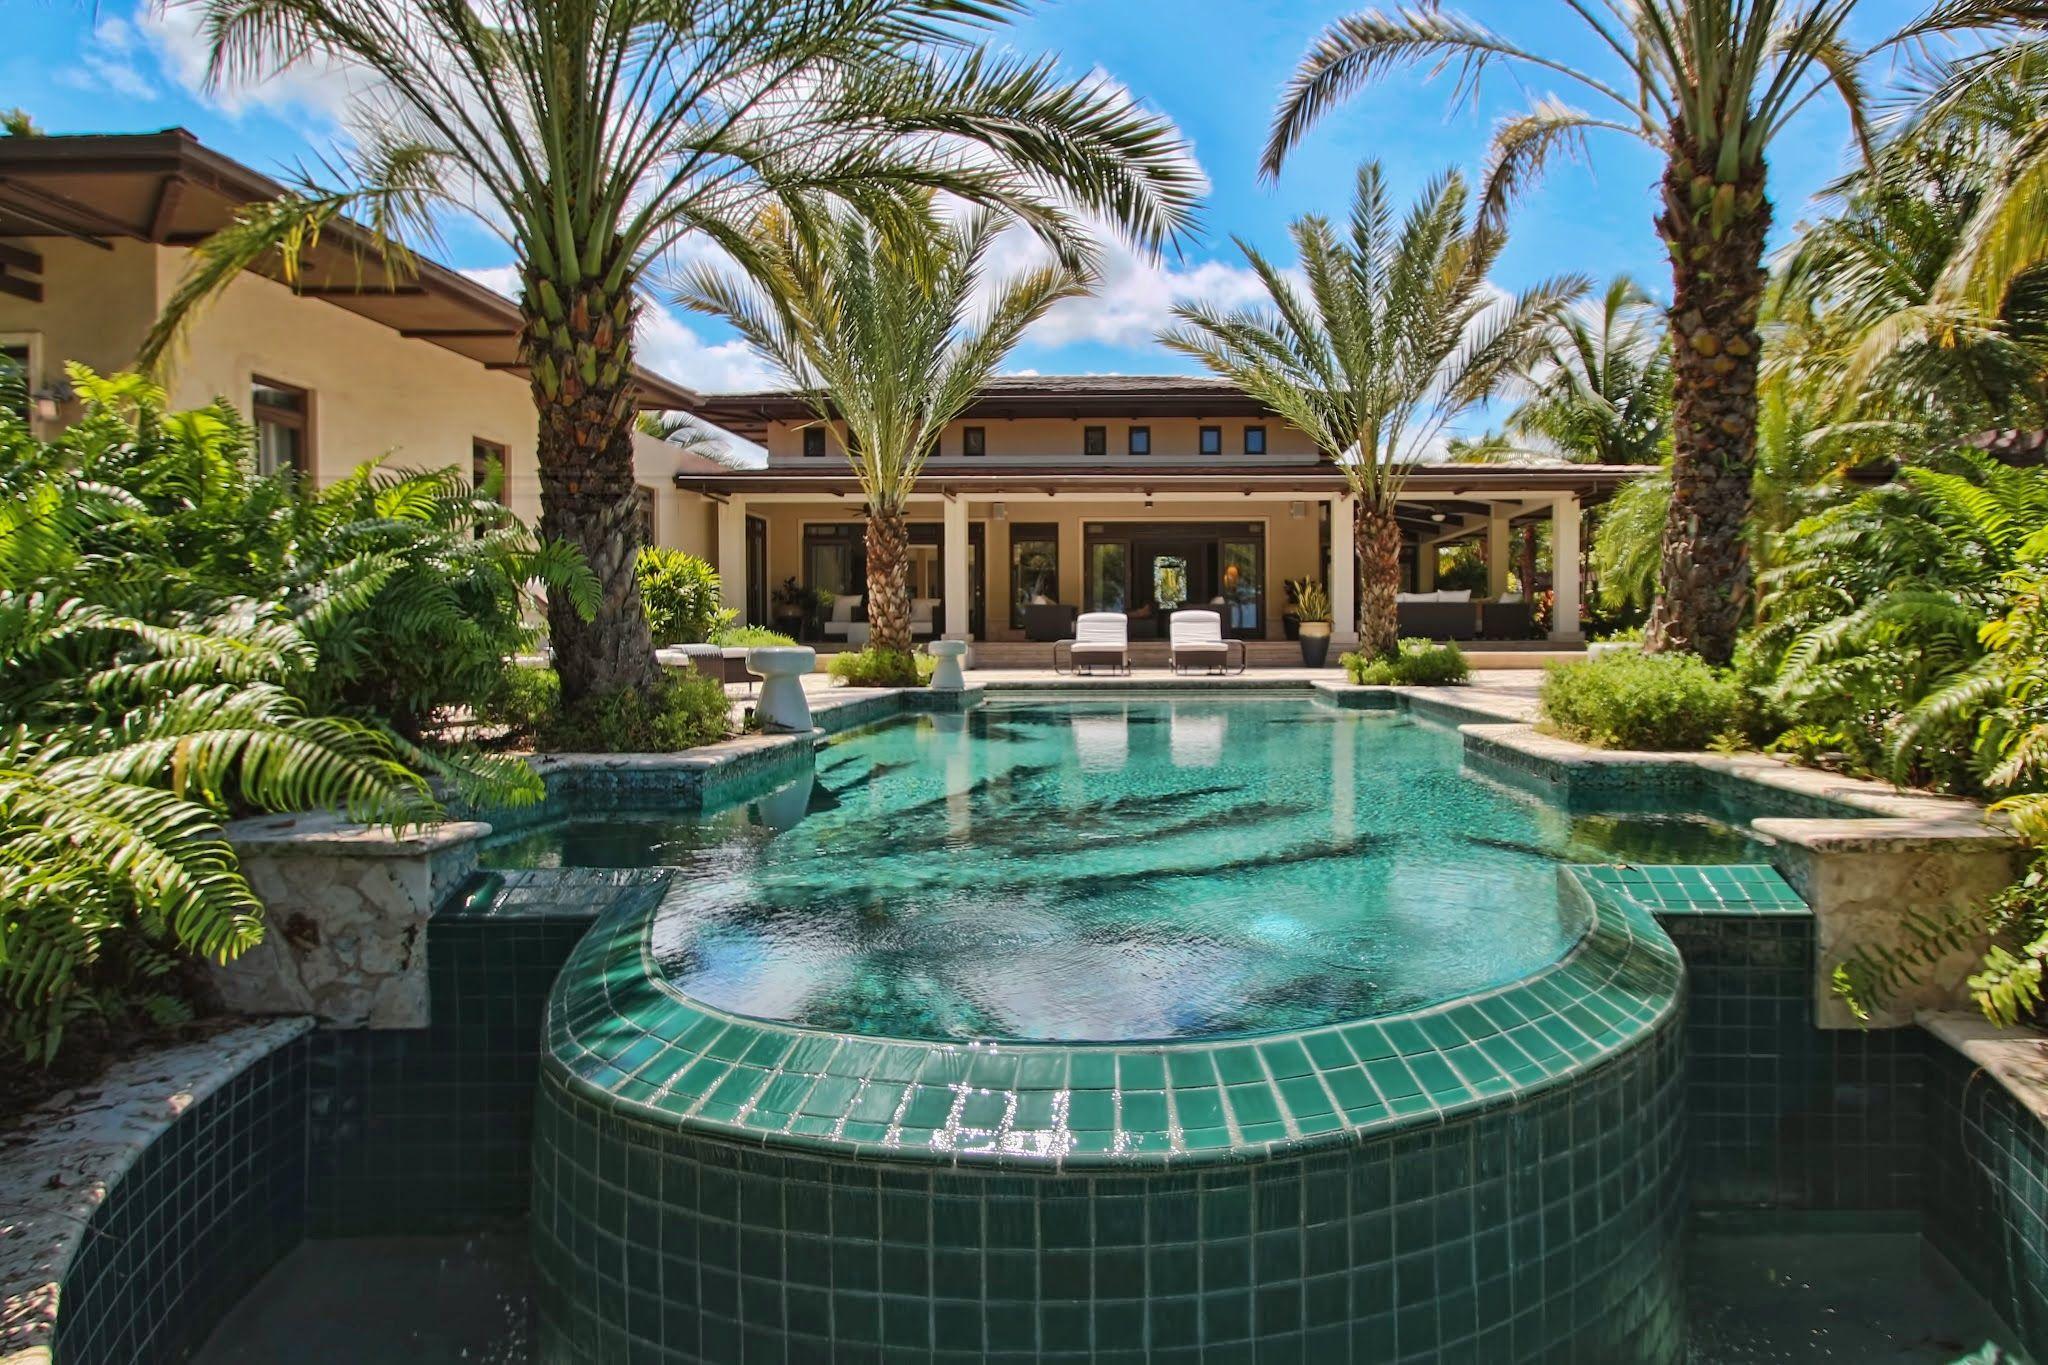 New Exclusive Listing Estancias At The St Regis Bahia Beach Resort Rio Grande Puerto Rico Justlisted P Resort Lifestyle Caribbean Real Estate Rio Grande